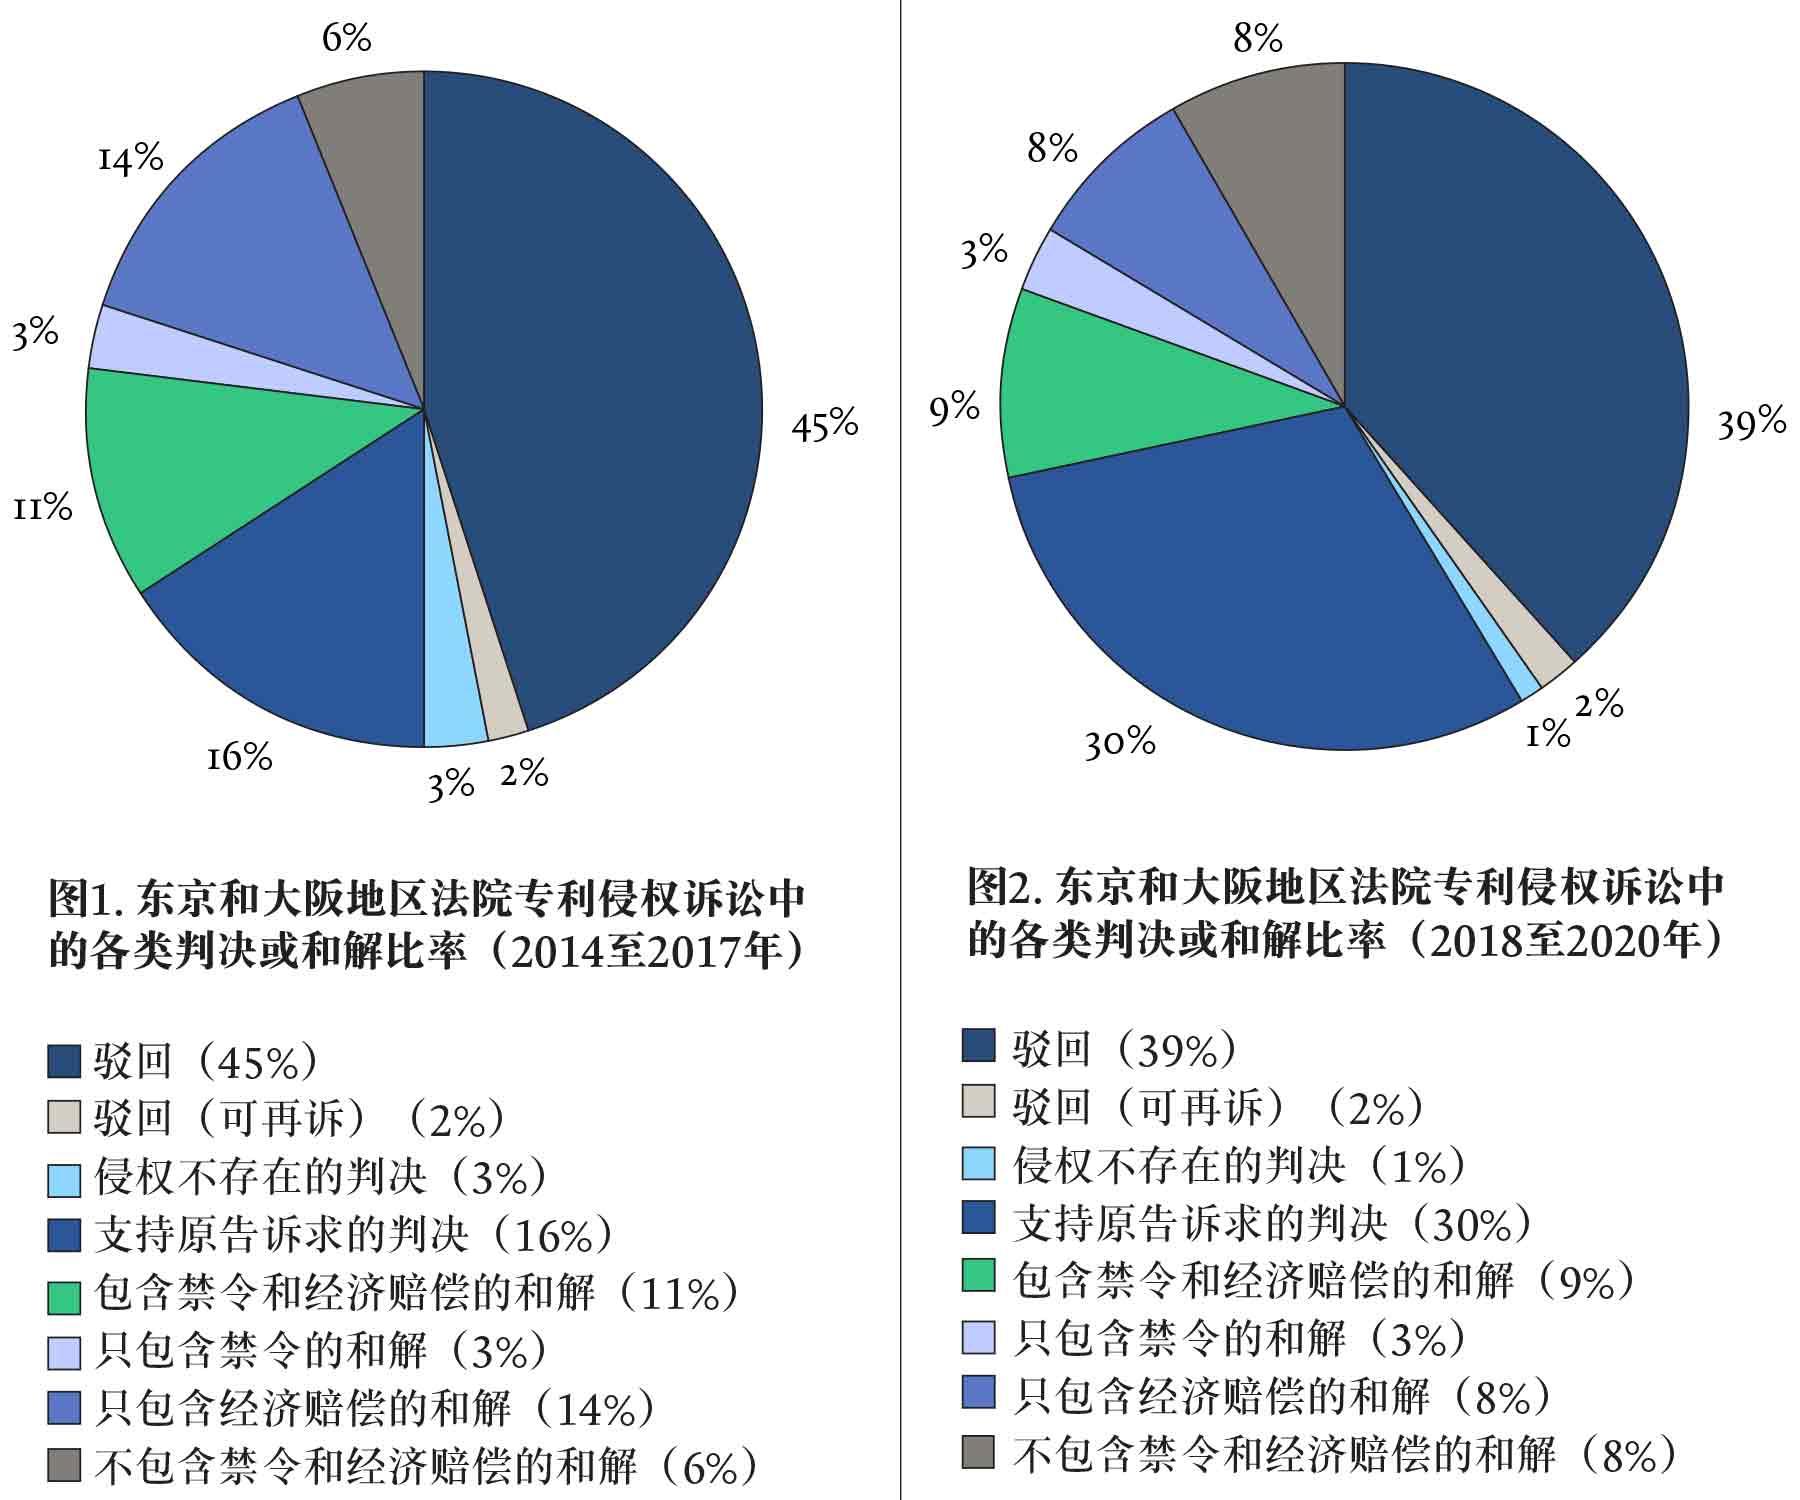 A-COMPARISON-OF-OF-PATENT-LAW-DEVELOPMENT-各国专利法发展对比-Chart-1-2-Chin